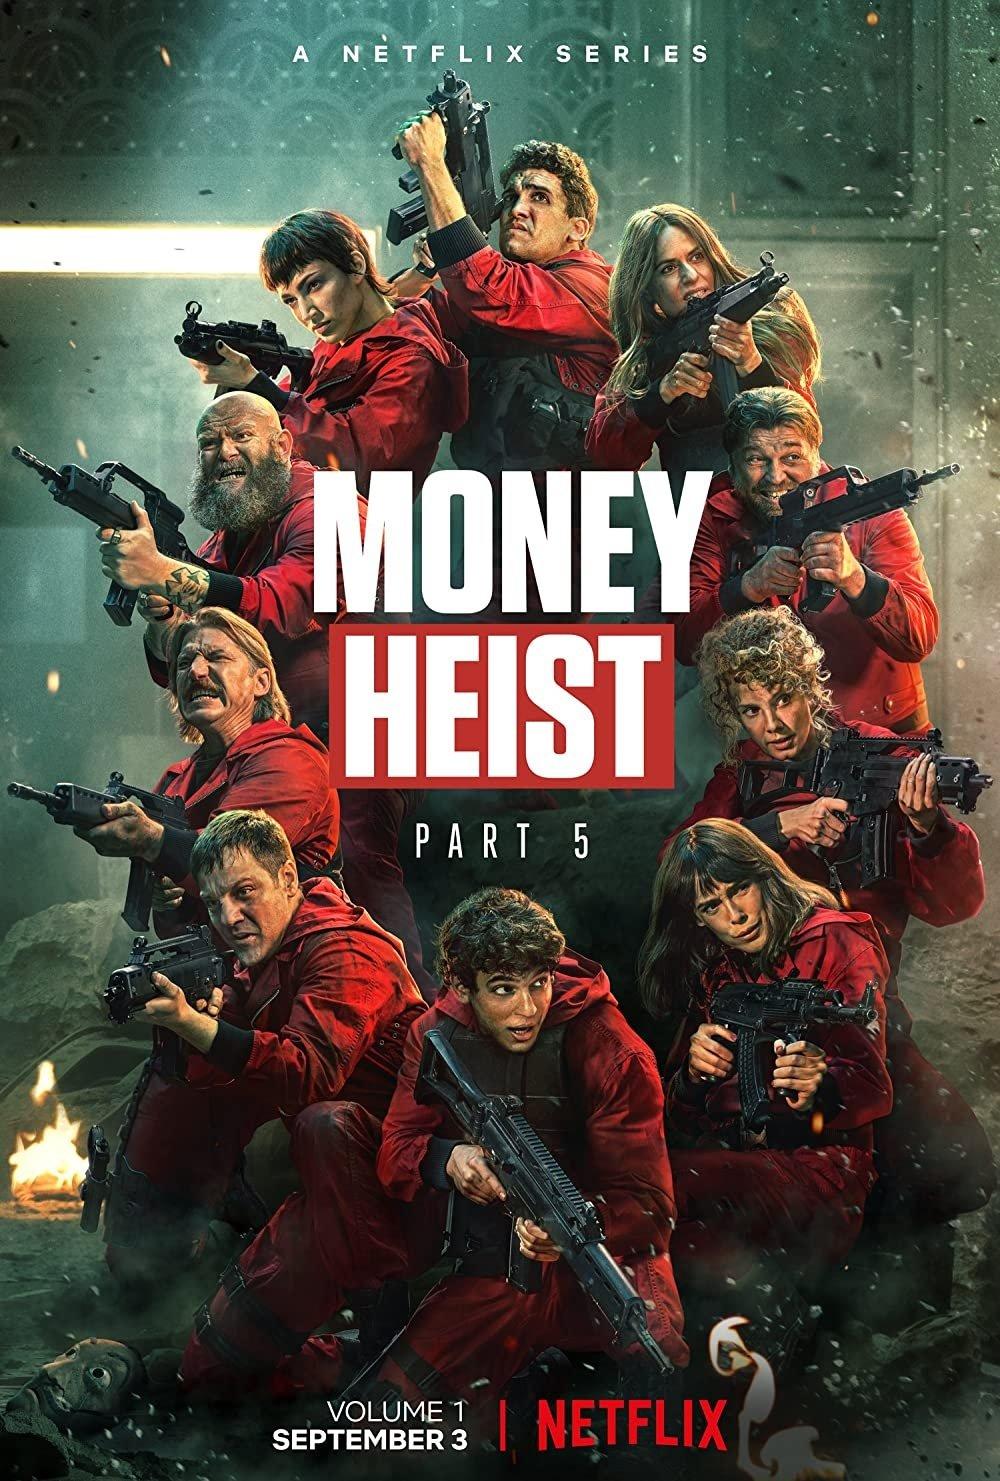 Money Heist: Part 5 Vol. 1